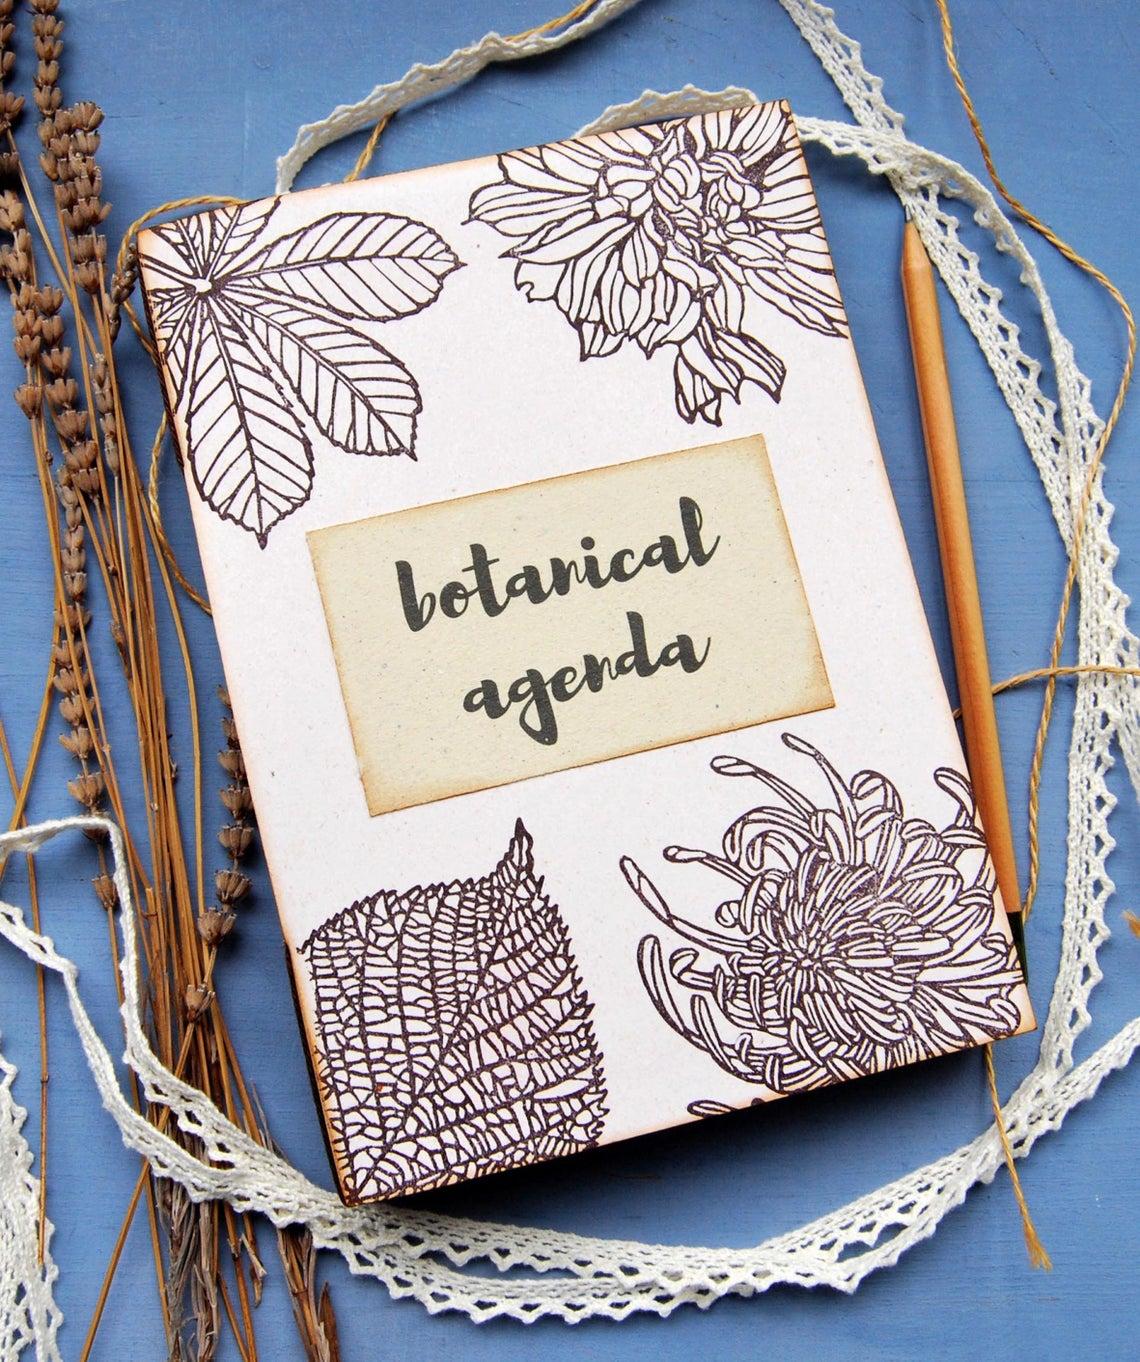 Agenda botanica